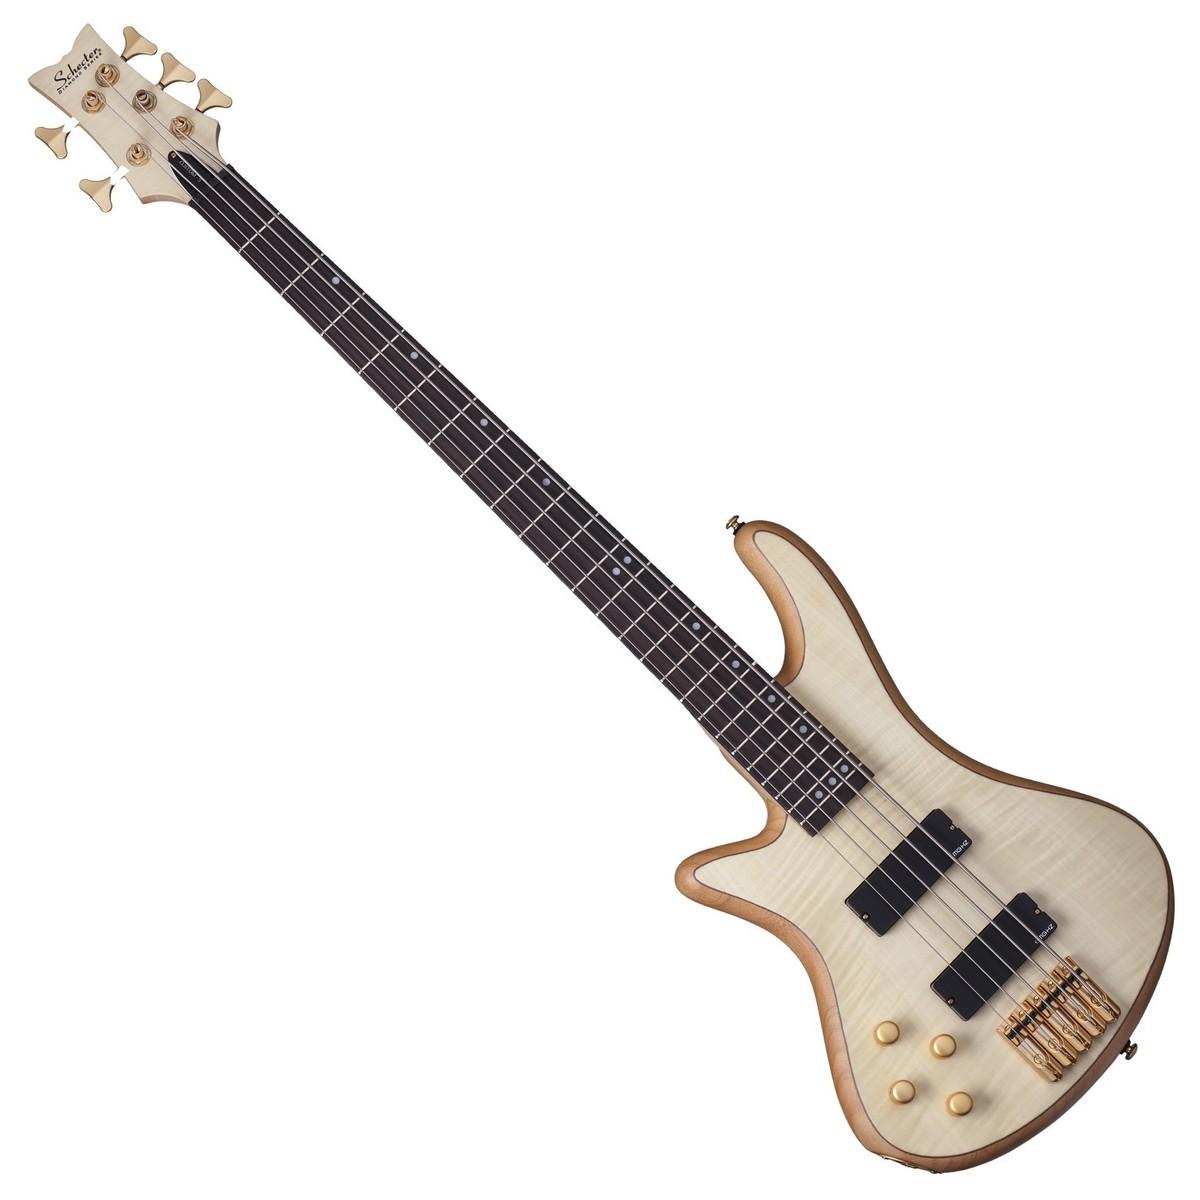 schecter stiletto custom 5 left handed bass guitar natural at gear4music. Black Bedroom Furniture Sets. Home Design Ideas